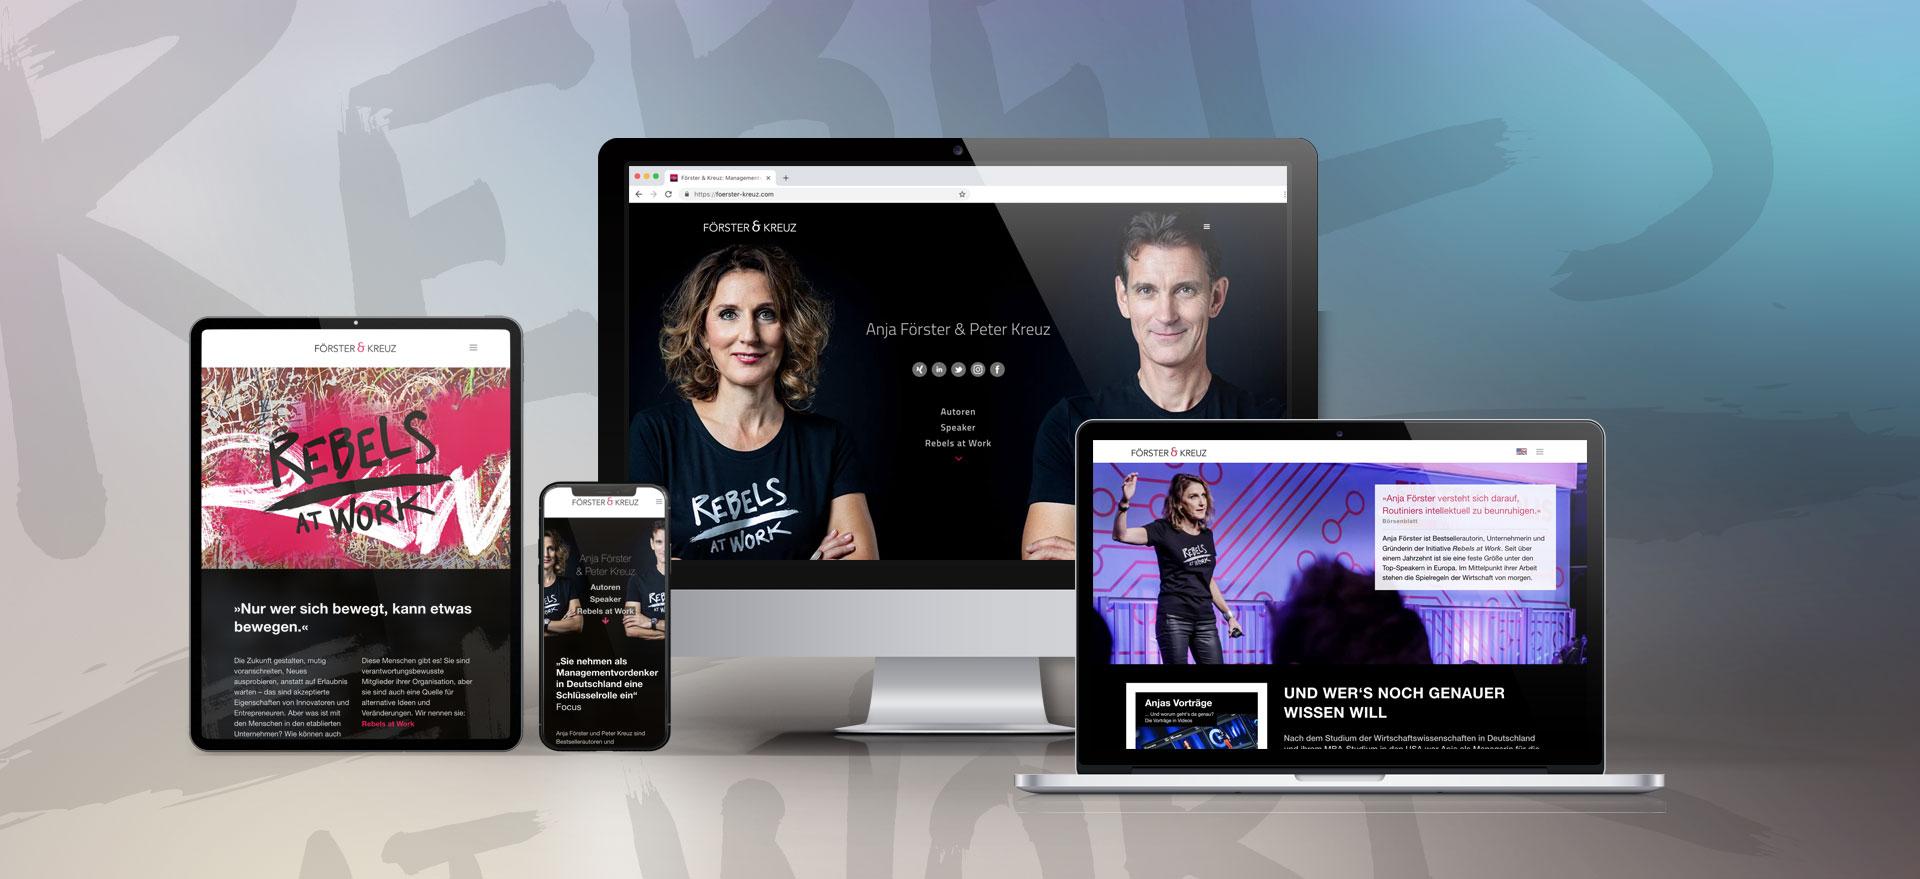 Webseite Förster & Kreuz